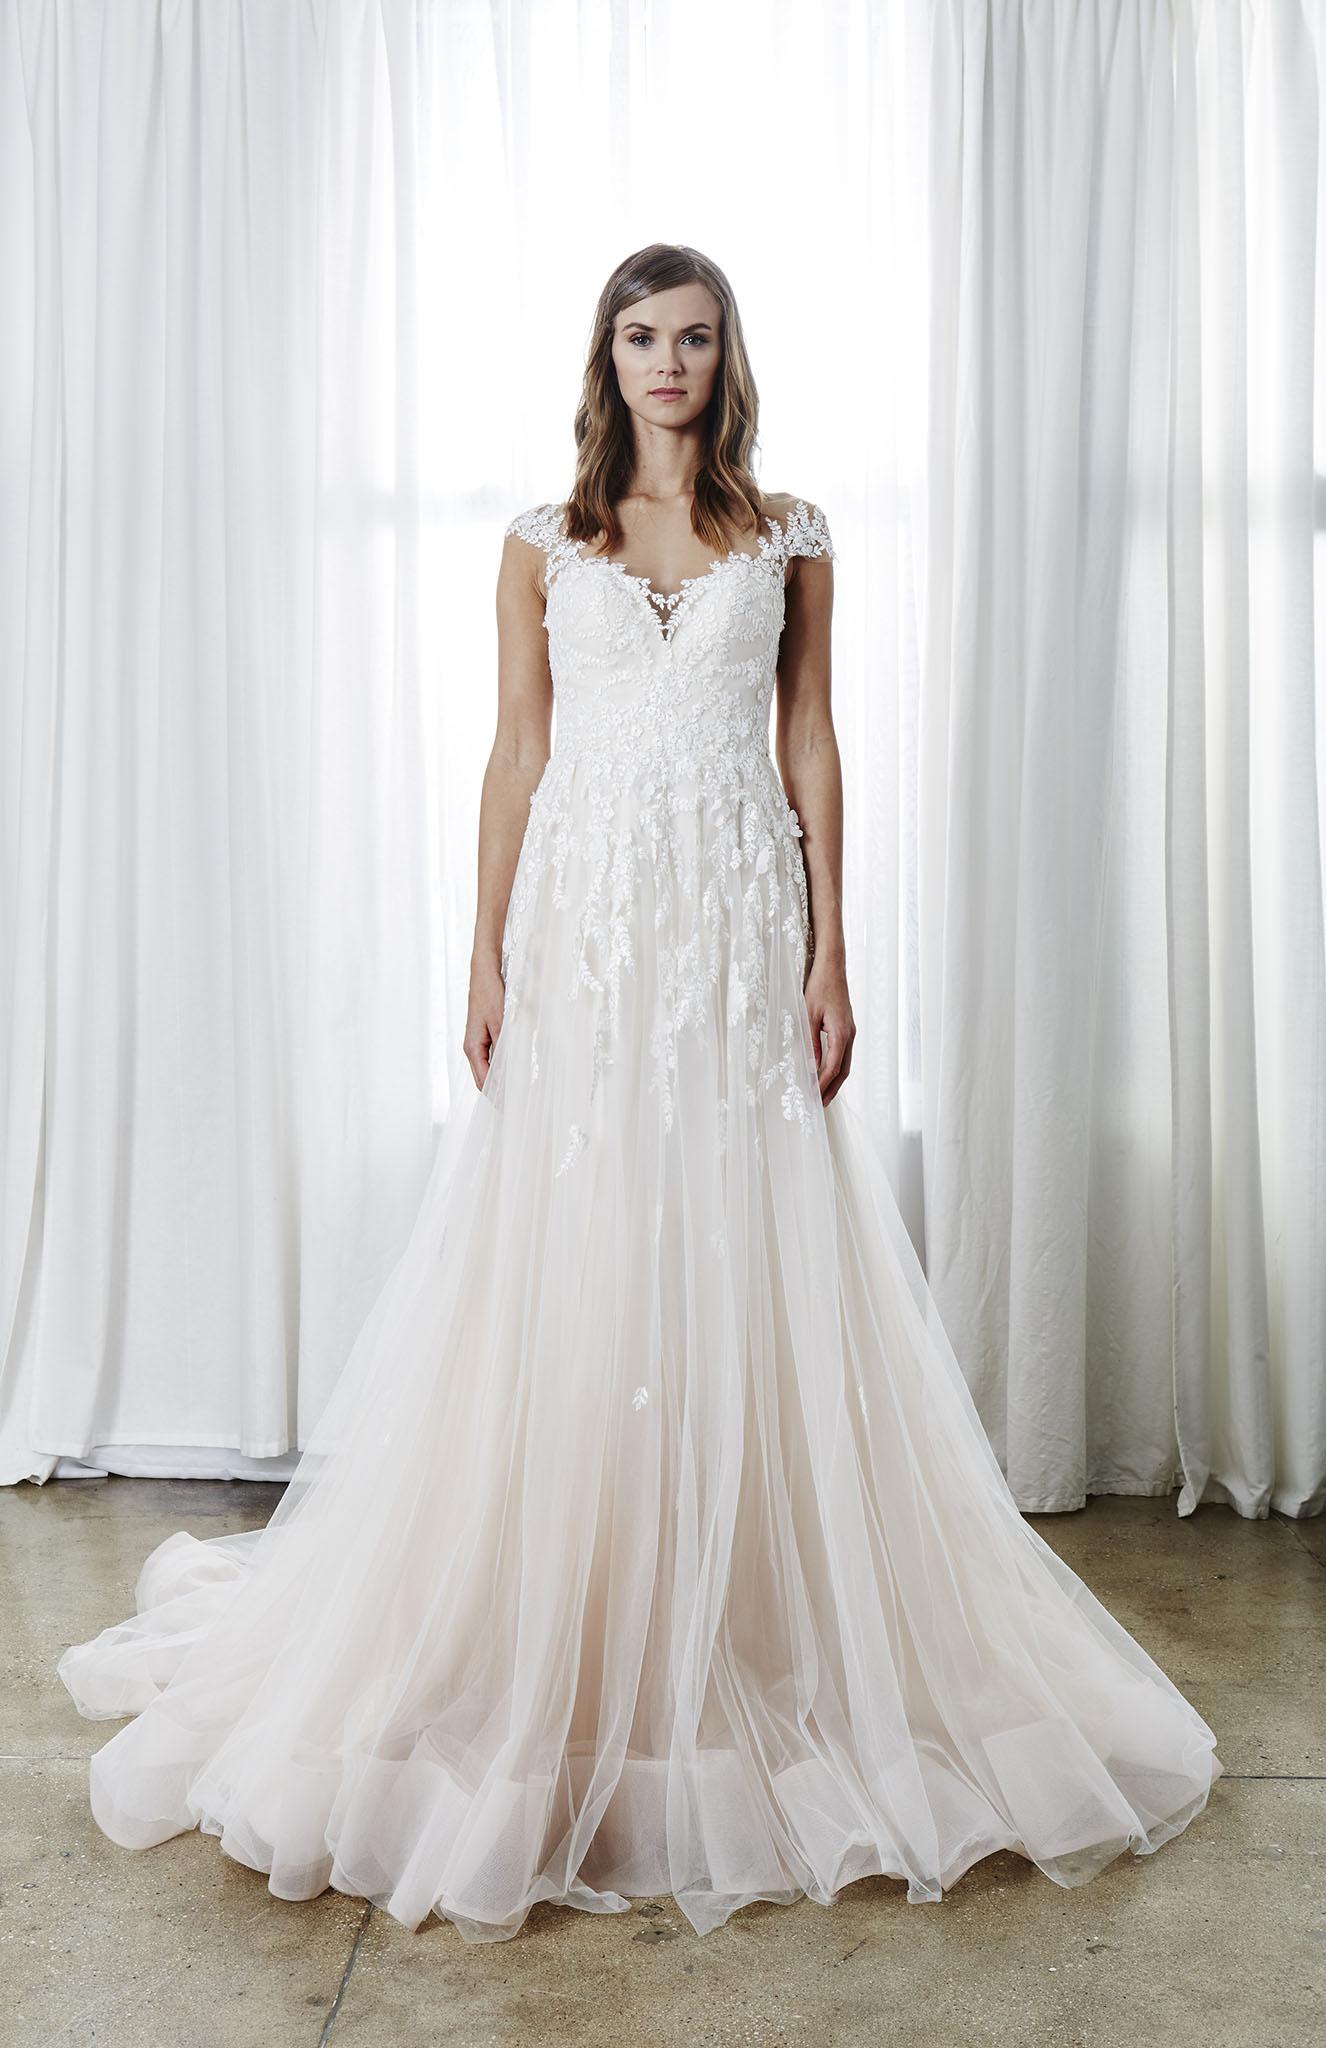 Kelly Faetanini Bridal Spring 2019